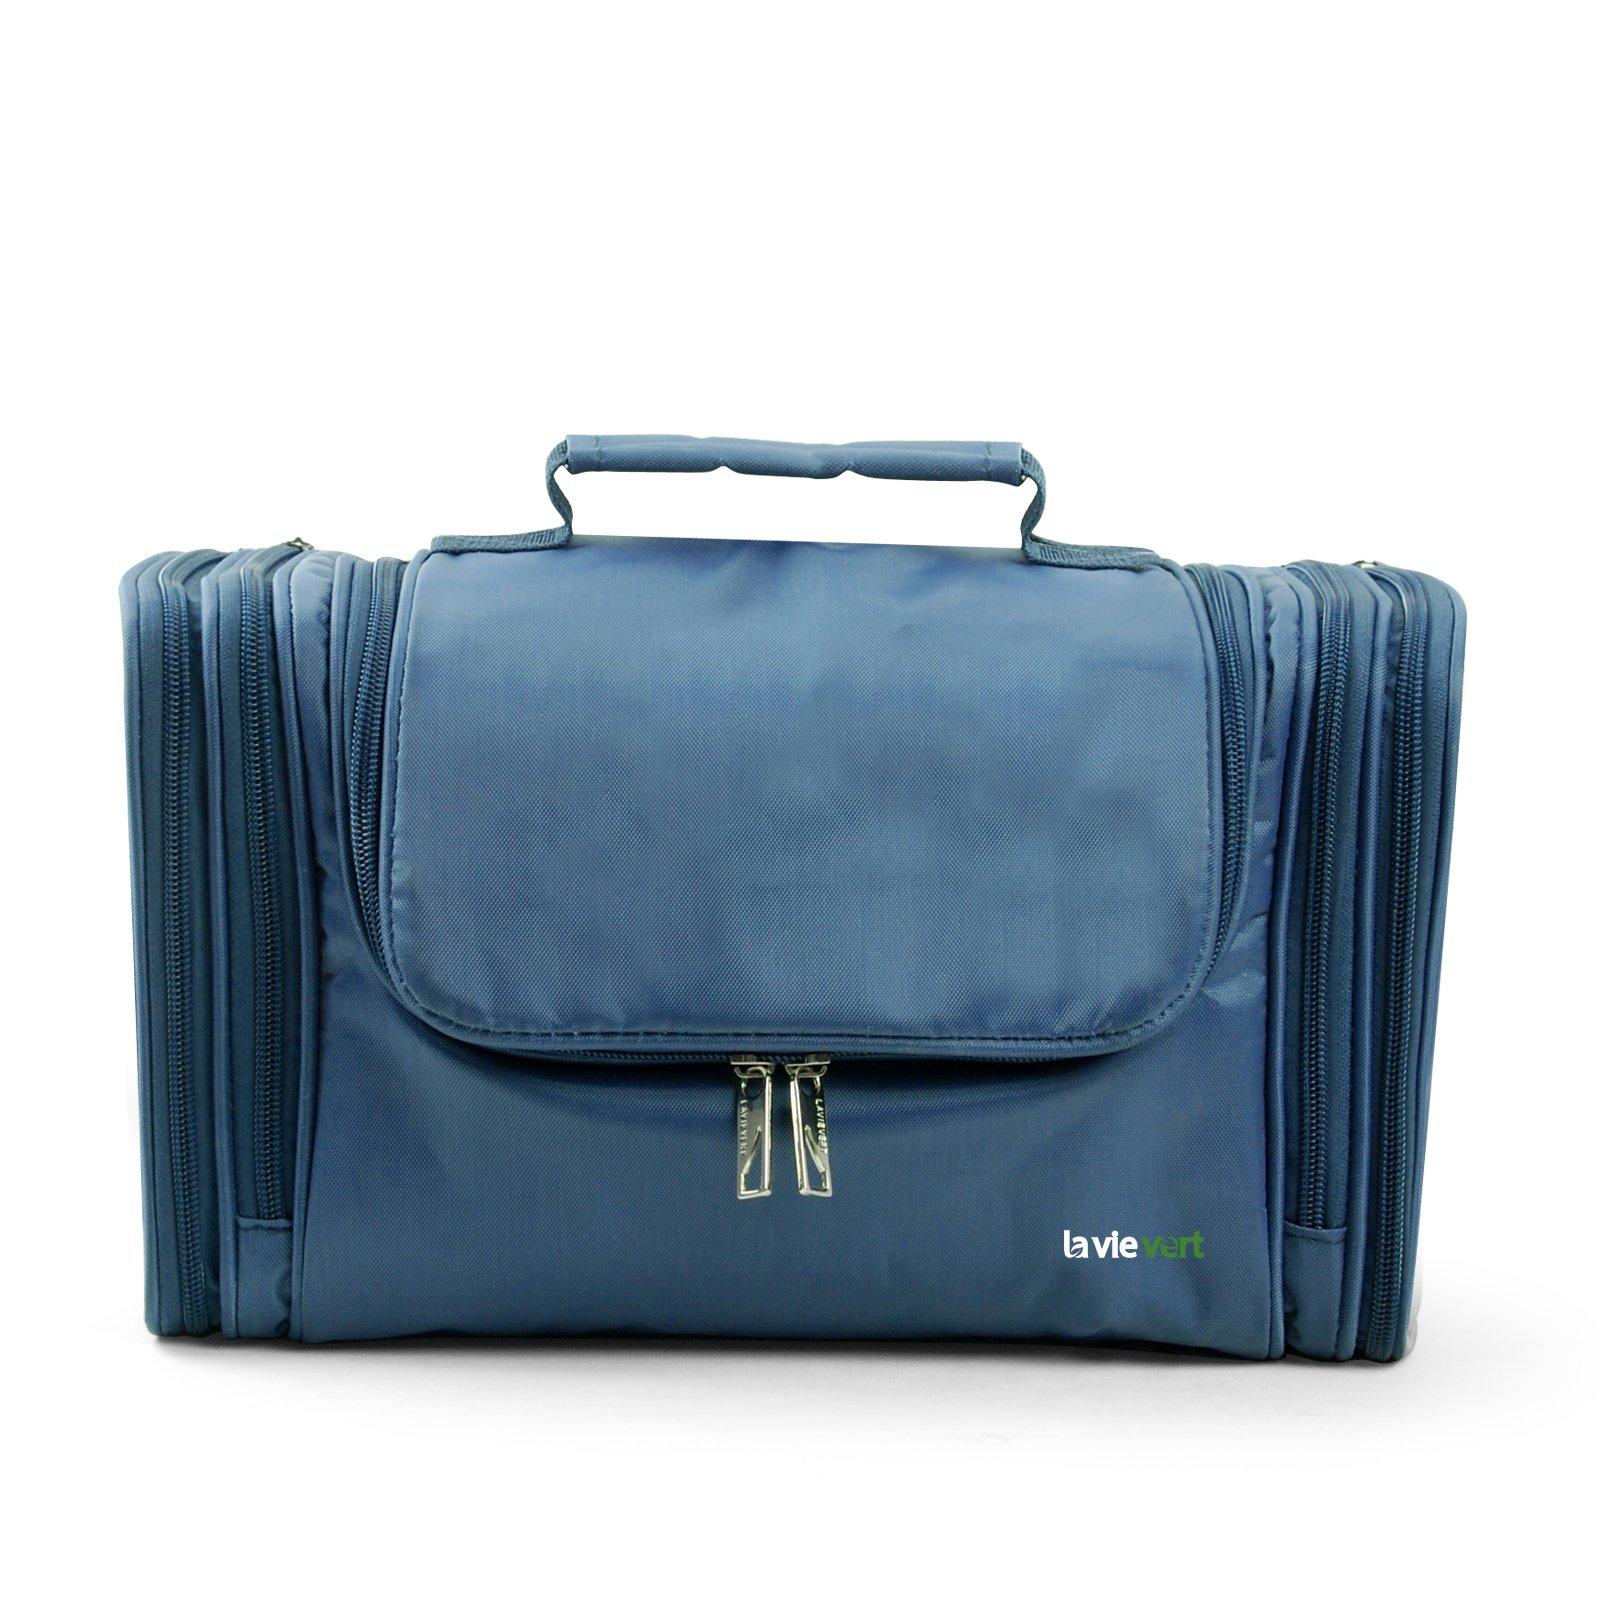 Amazon.com : Lavievert Toiletry Bag/Makeup Organizer/Cosmetic Bag ...